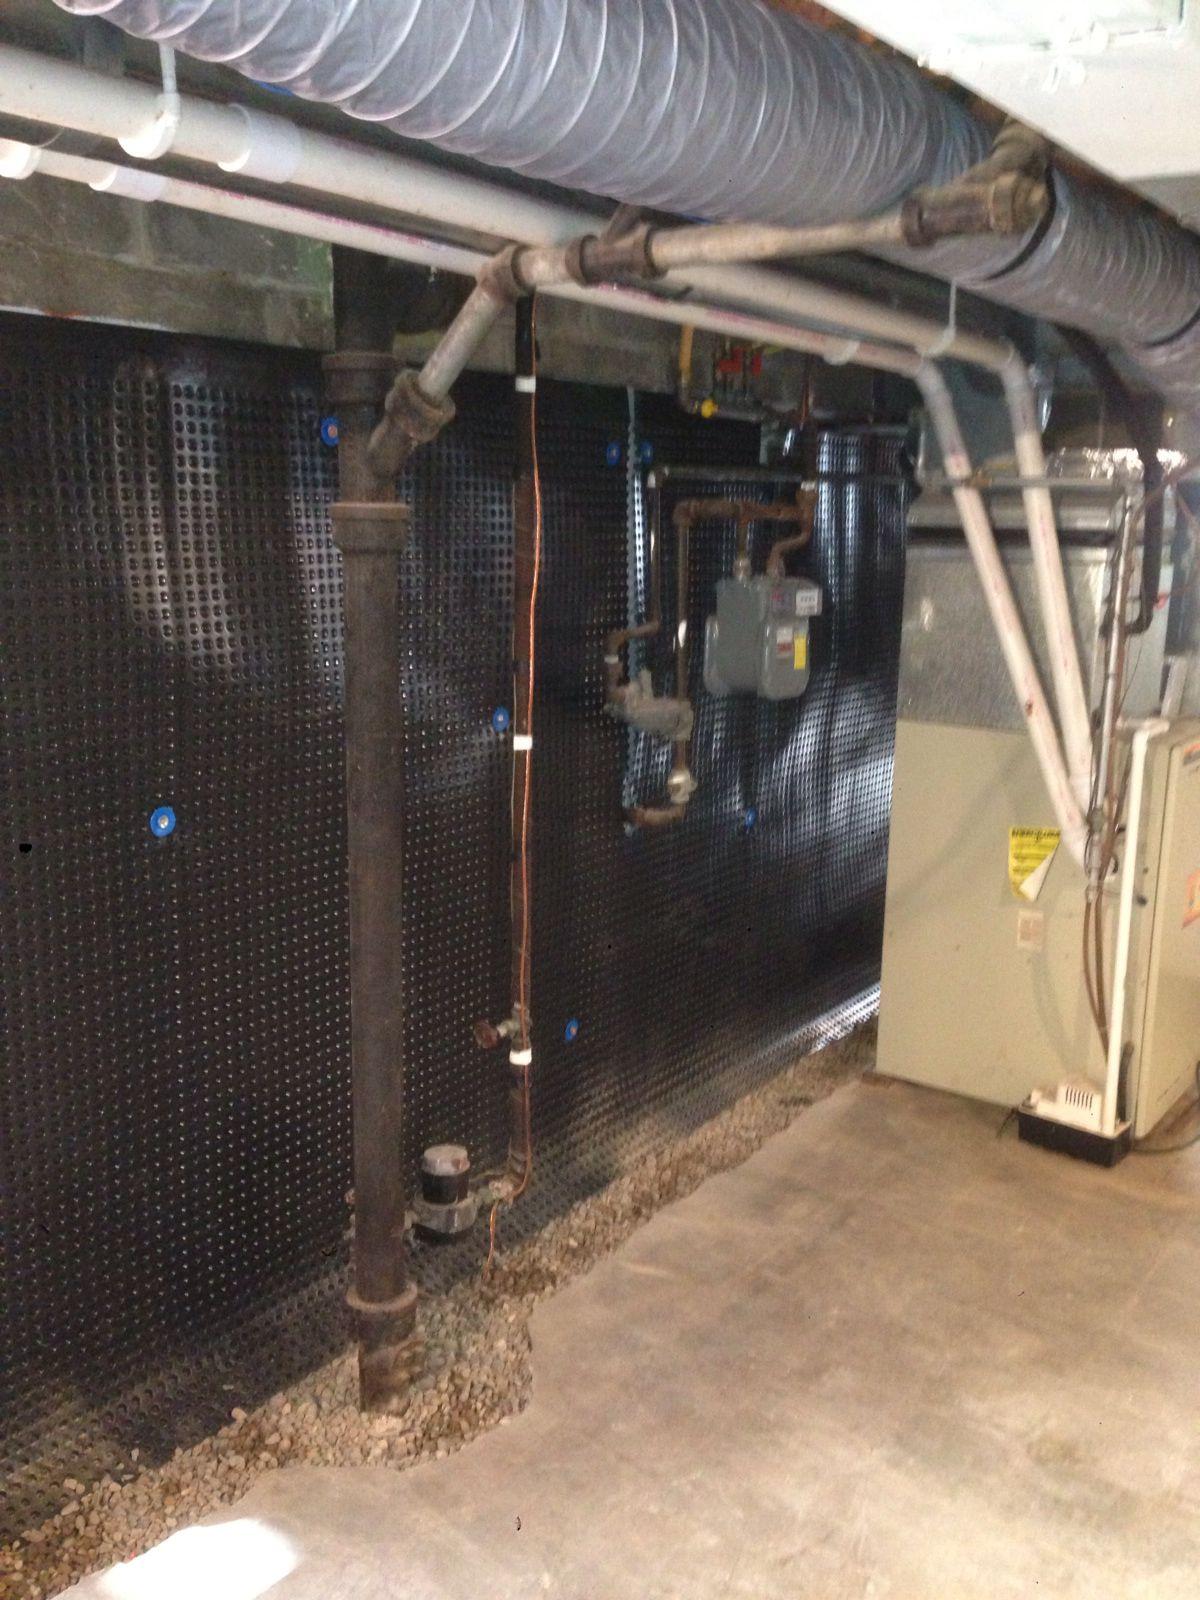 Interior Drain Tile Systems Dimple Up The Wall To Grade Affordable Egress Windows Basement Wate Cheap Basement Ideas Waterproofing Basement Basement Design